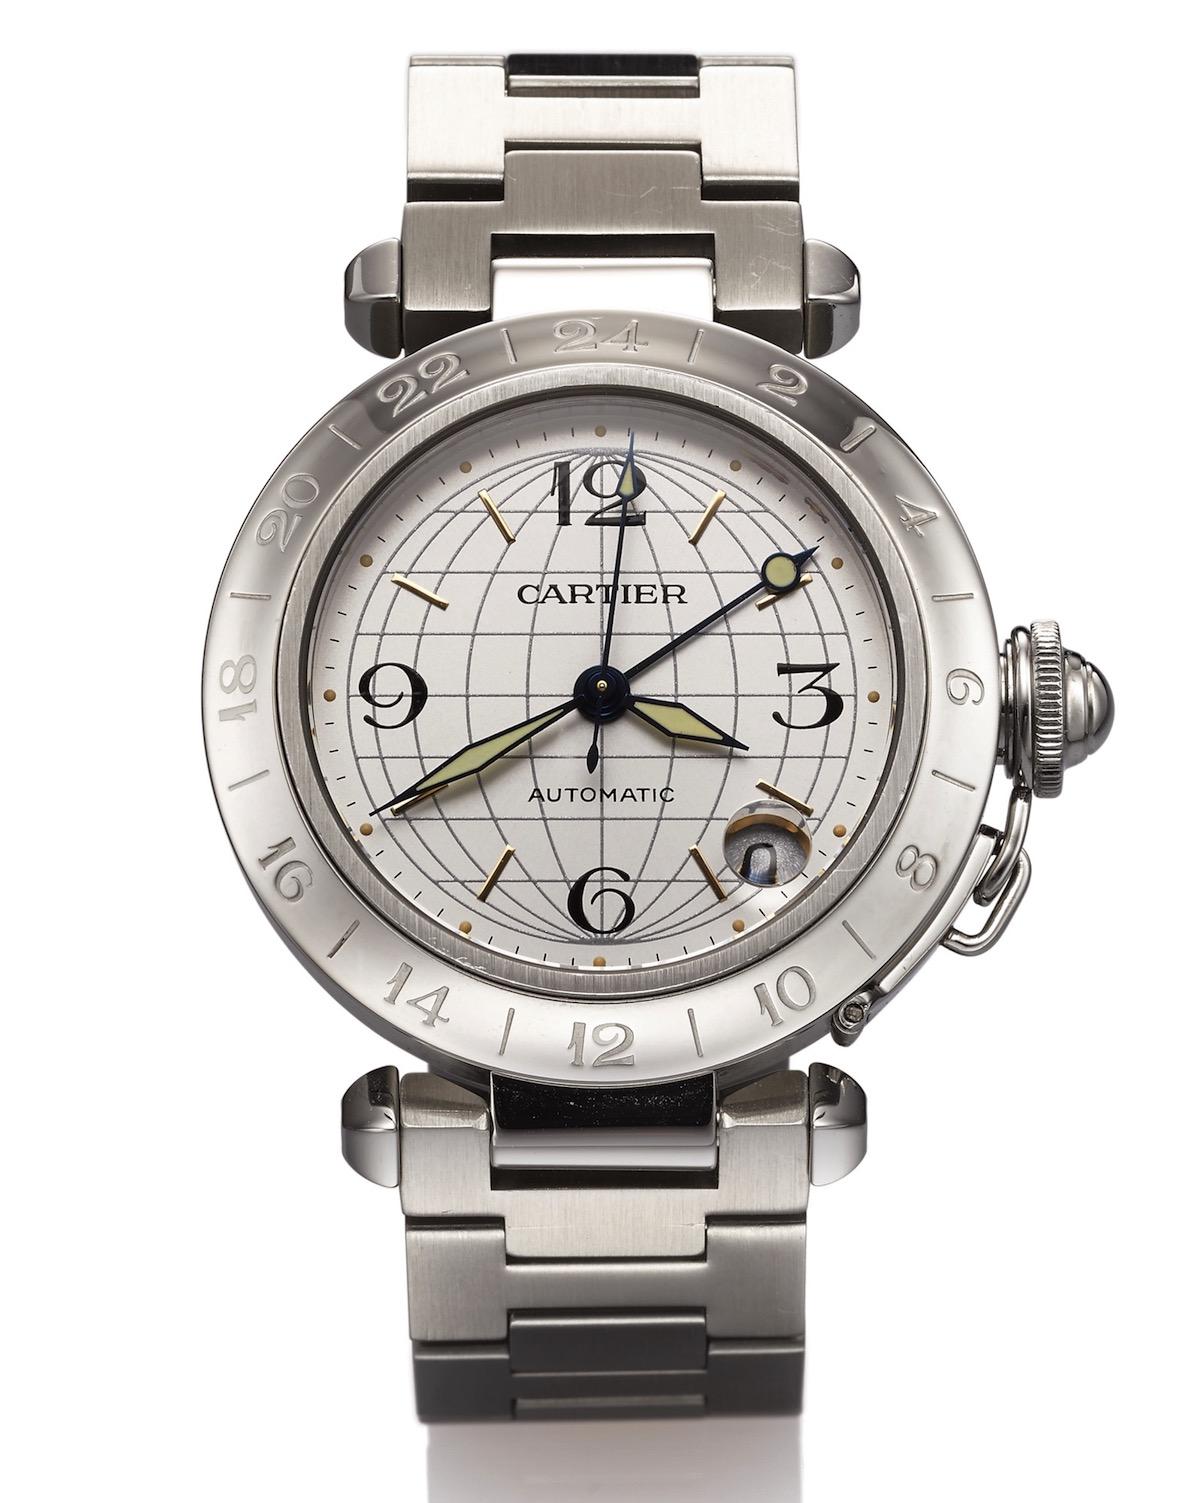 Affordable At Auction: Cartier Pasha C GMT